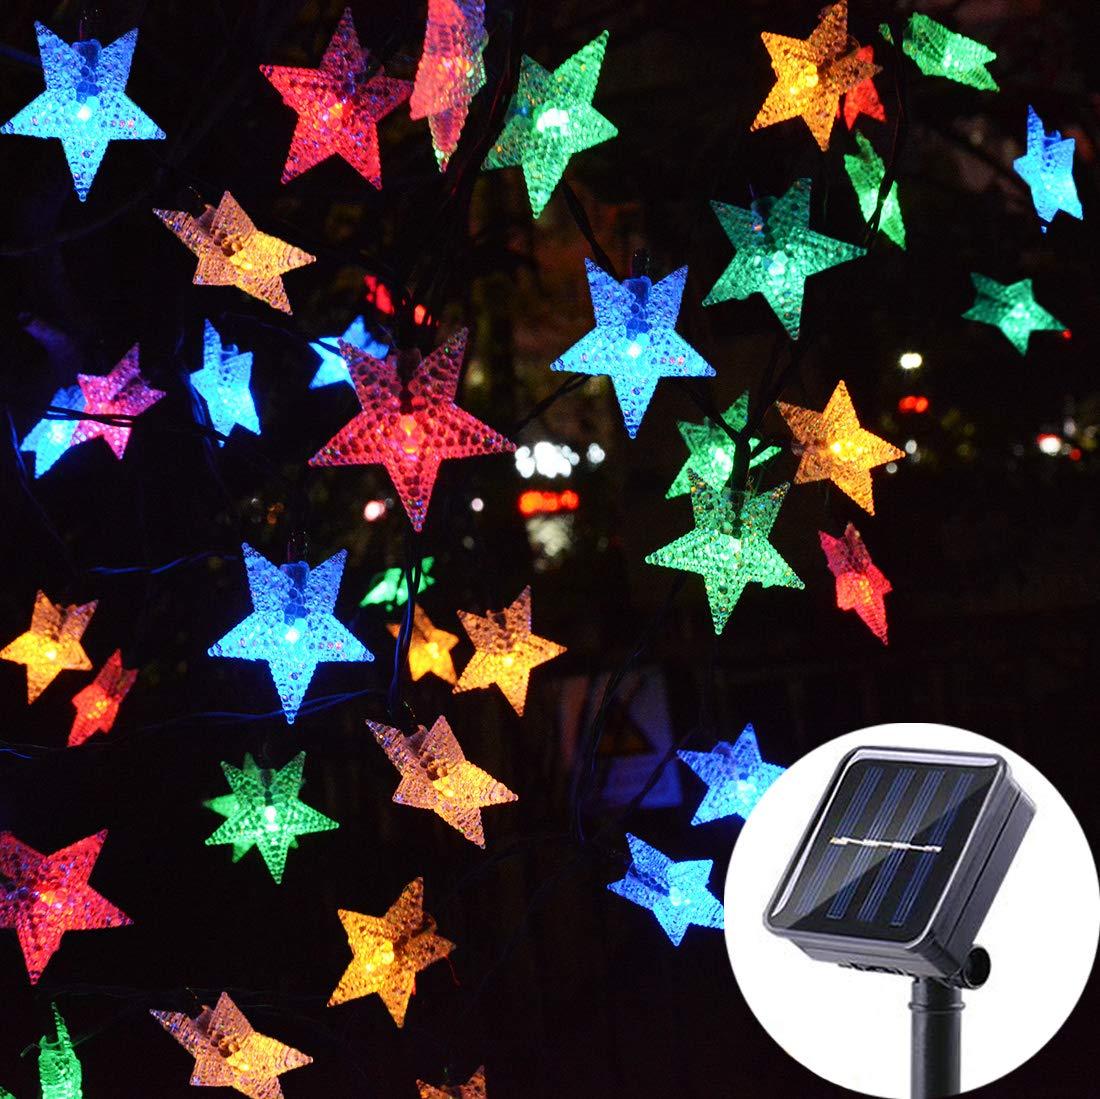 Huacenmy Star Solar String Lights